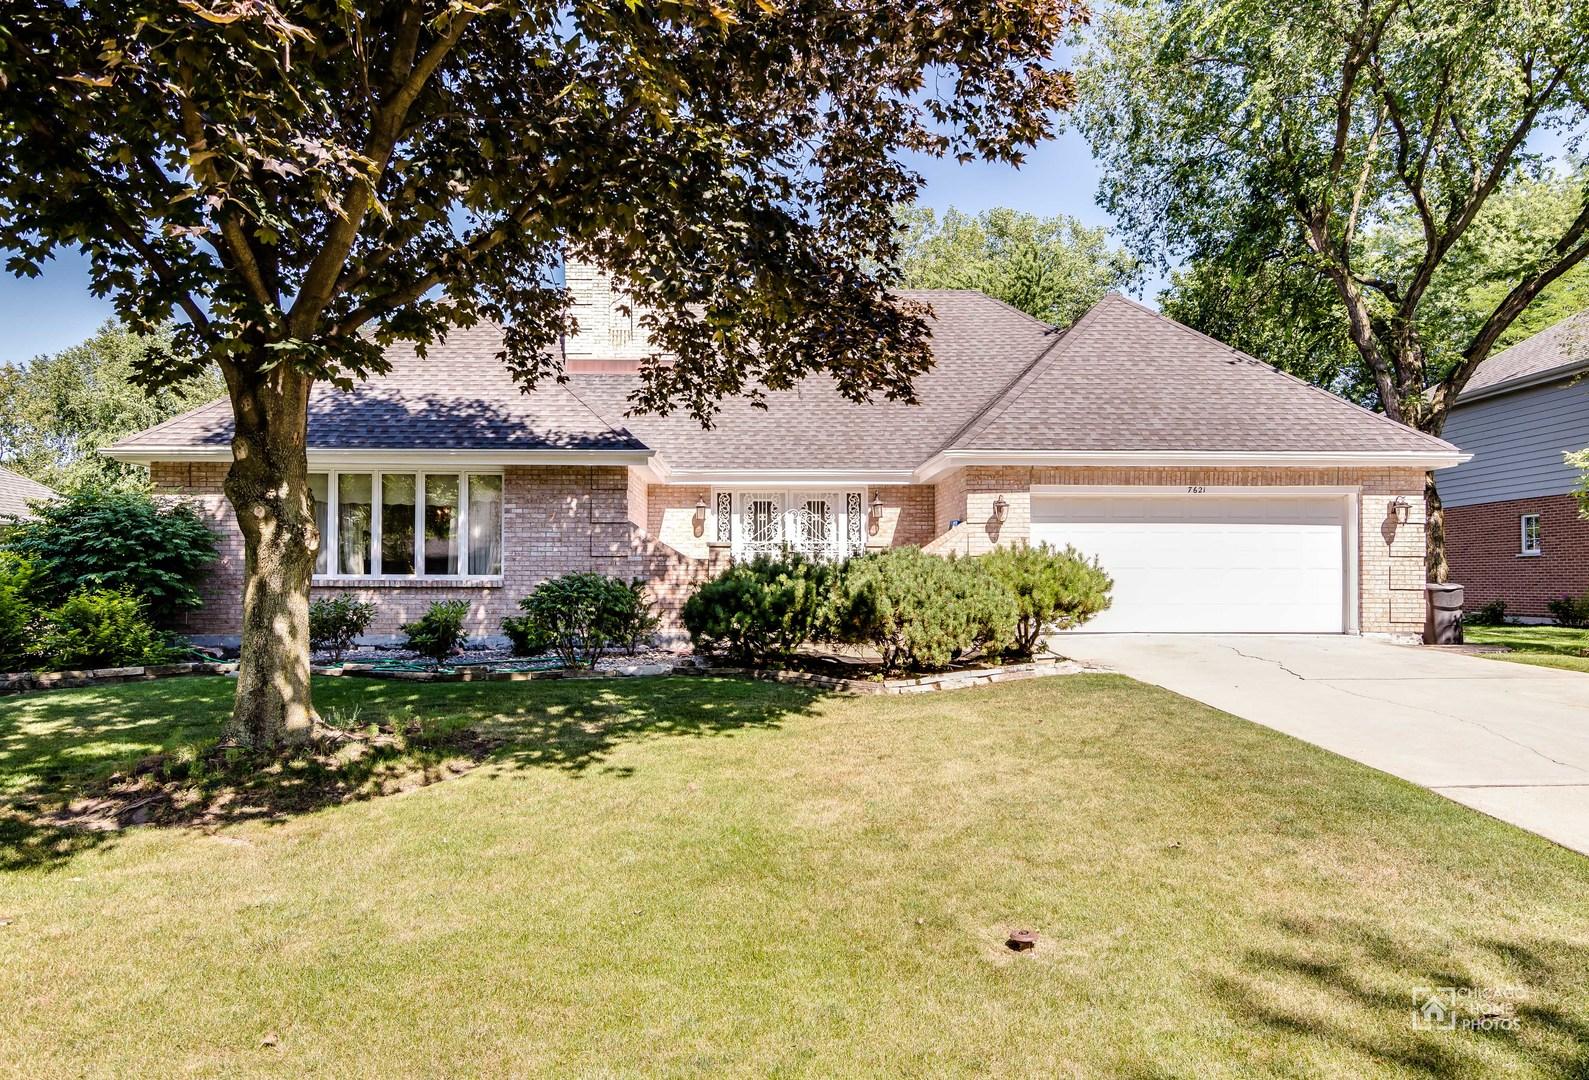 7621 Ridgewood Lane, Burr Ridge in Cook County, IL 60527 Home for Sale